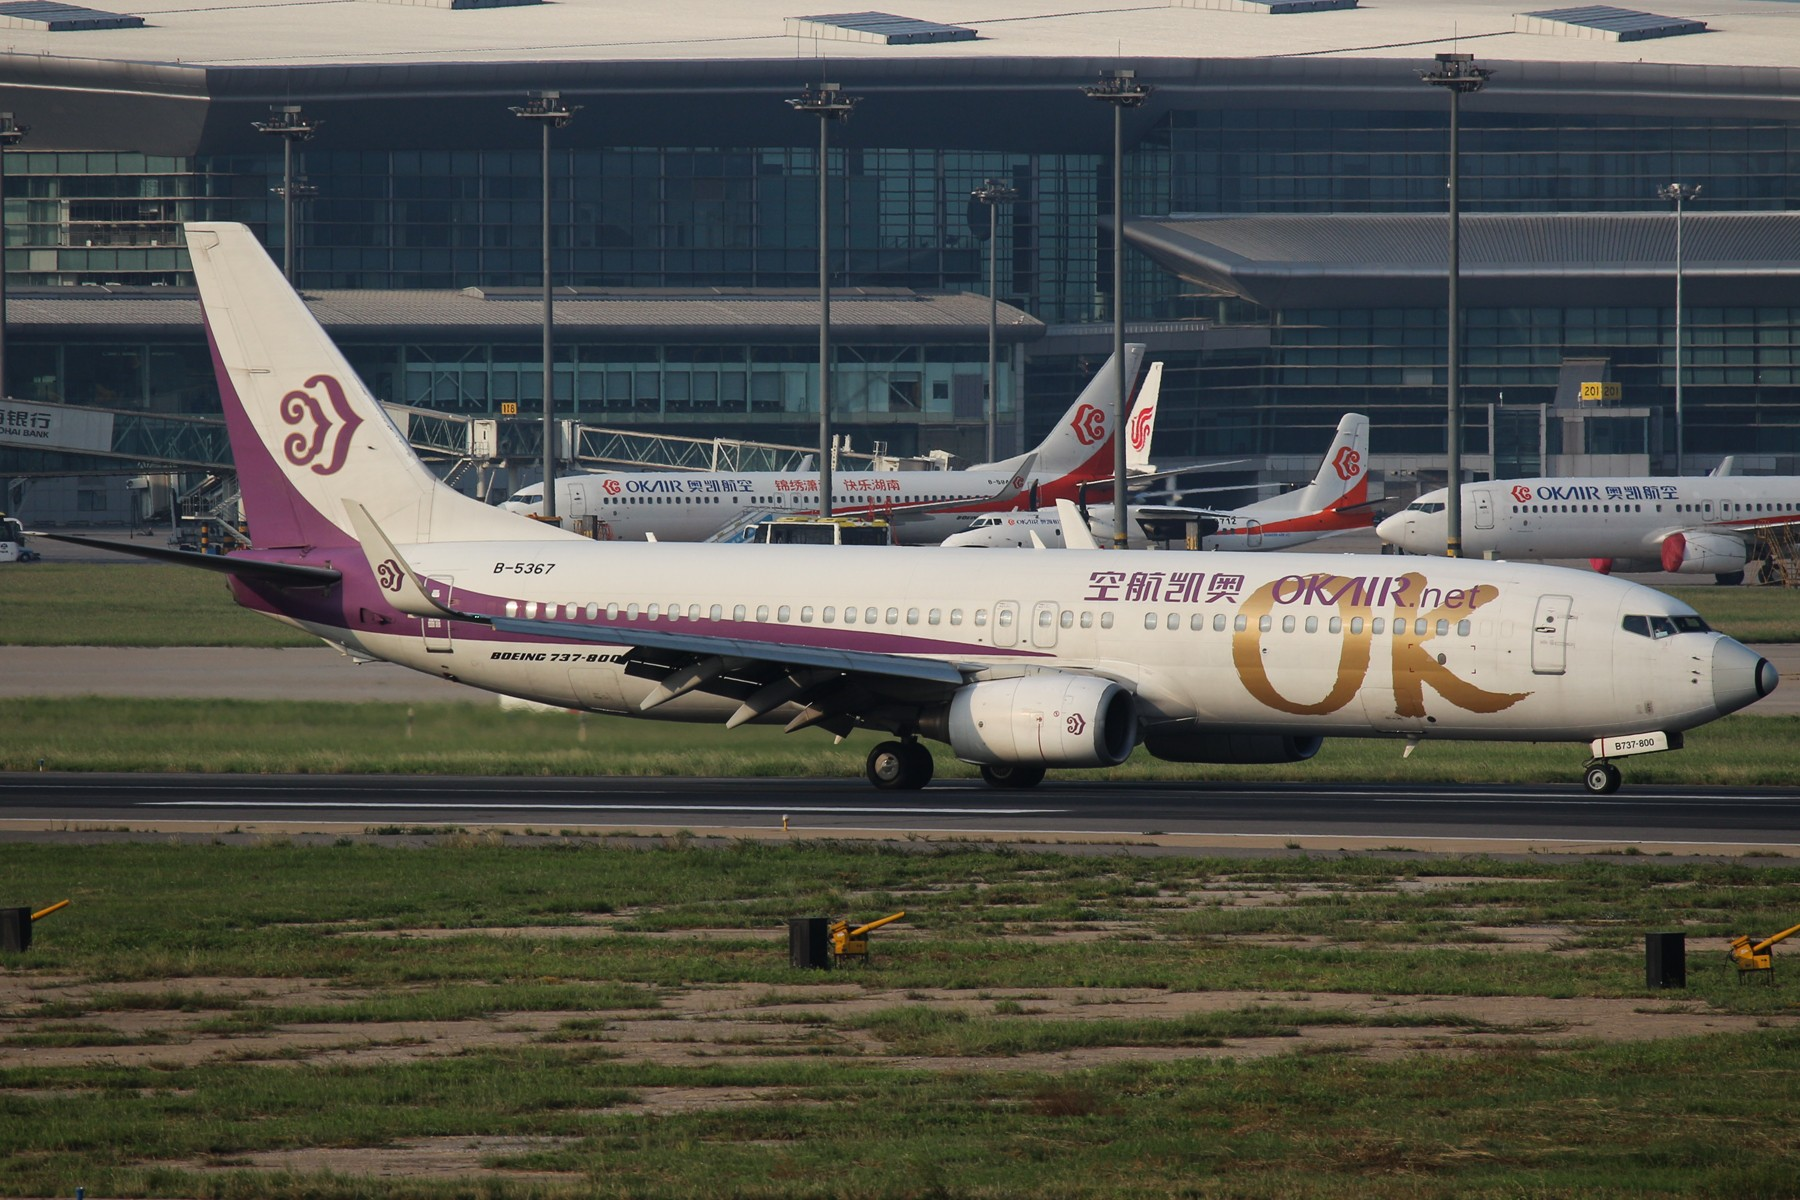 Re:[原创]【TSN拍机帖】1800*1200大图 13pics BOEING 737-800 B-5367 中国天津滨海国际机场